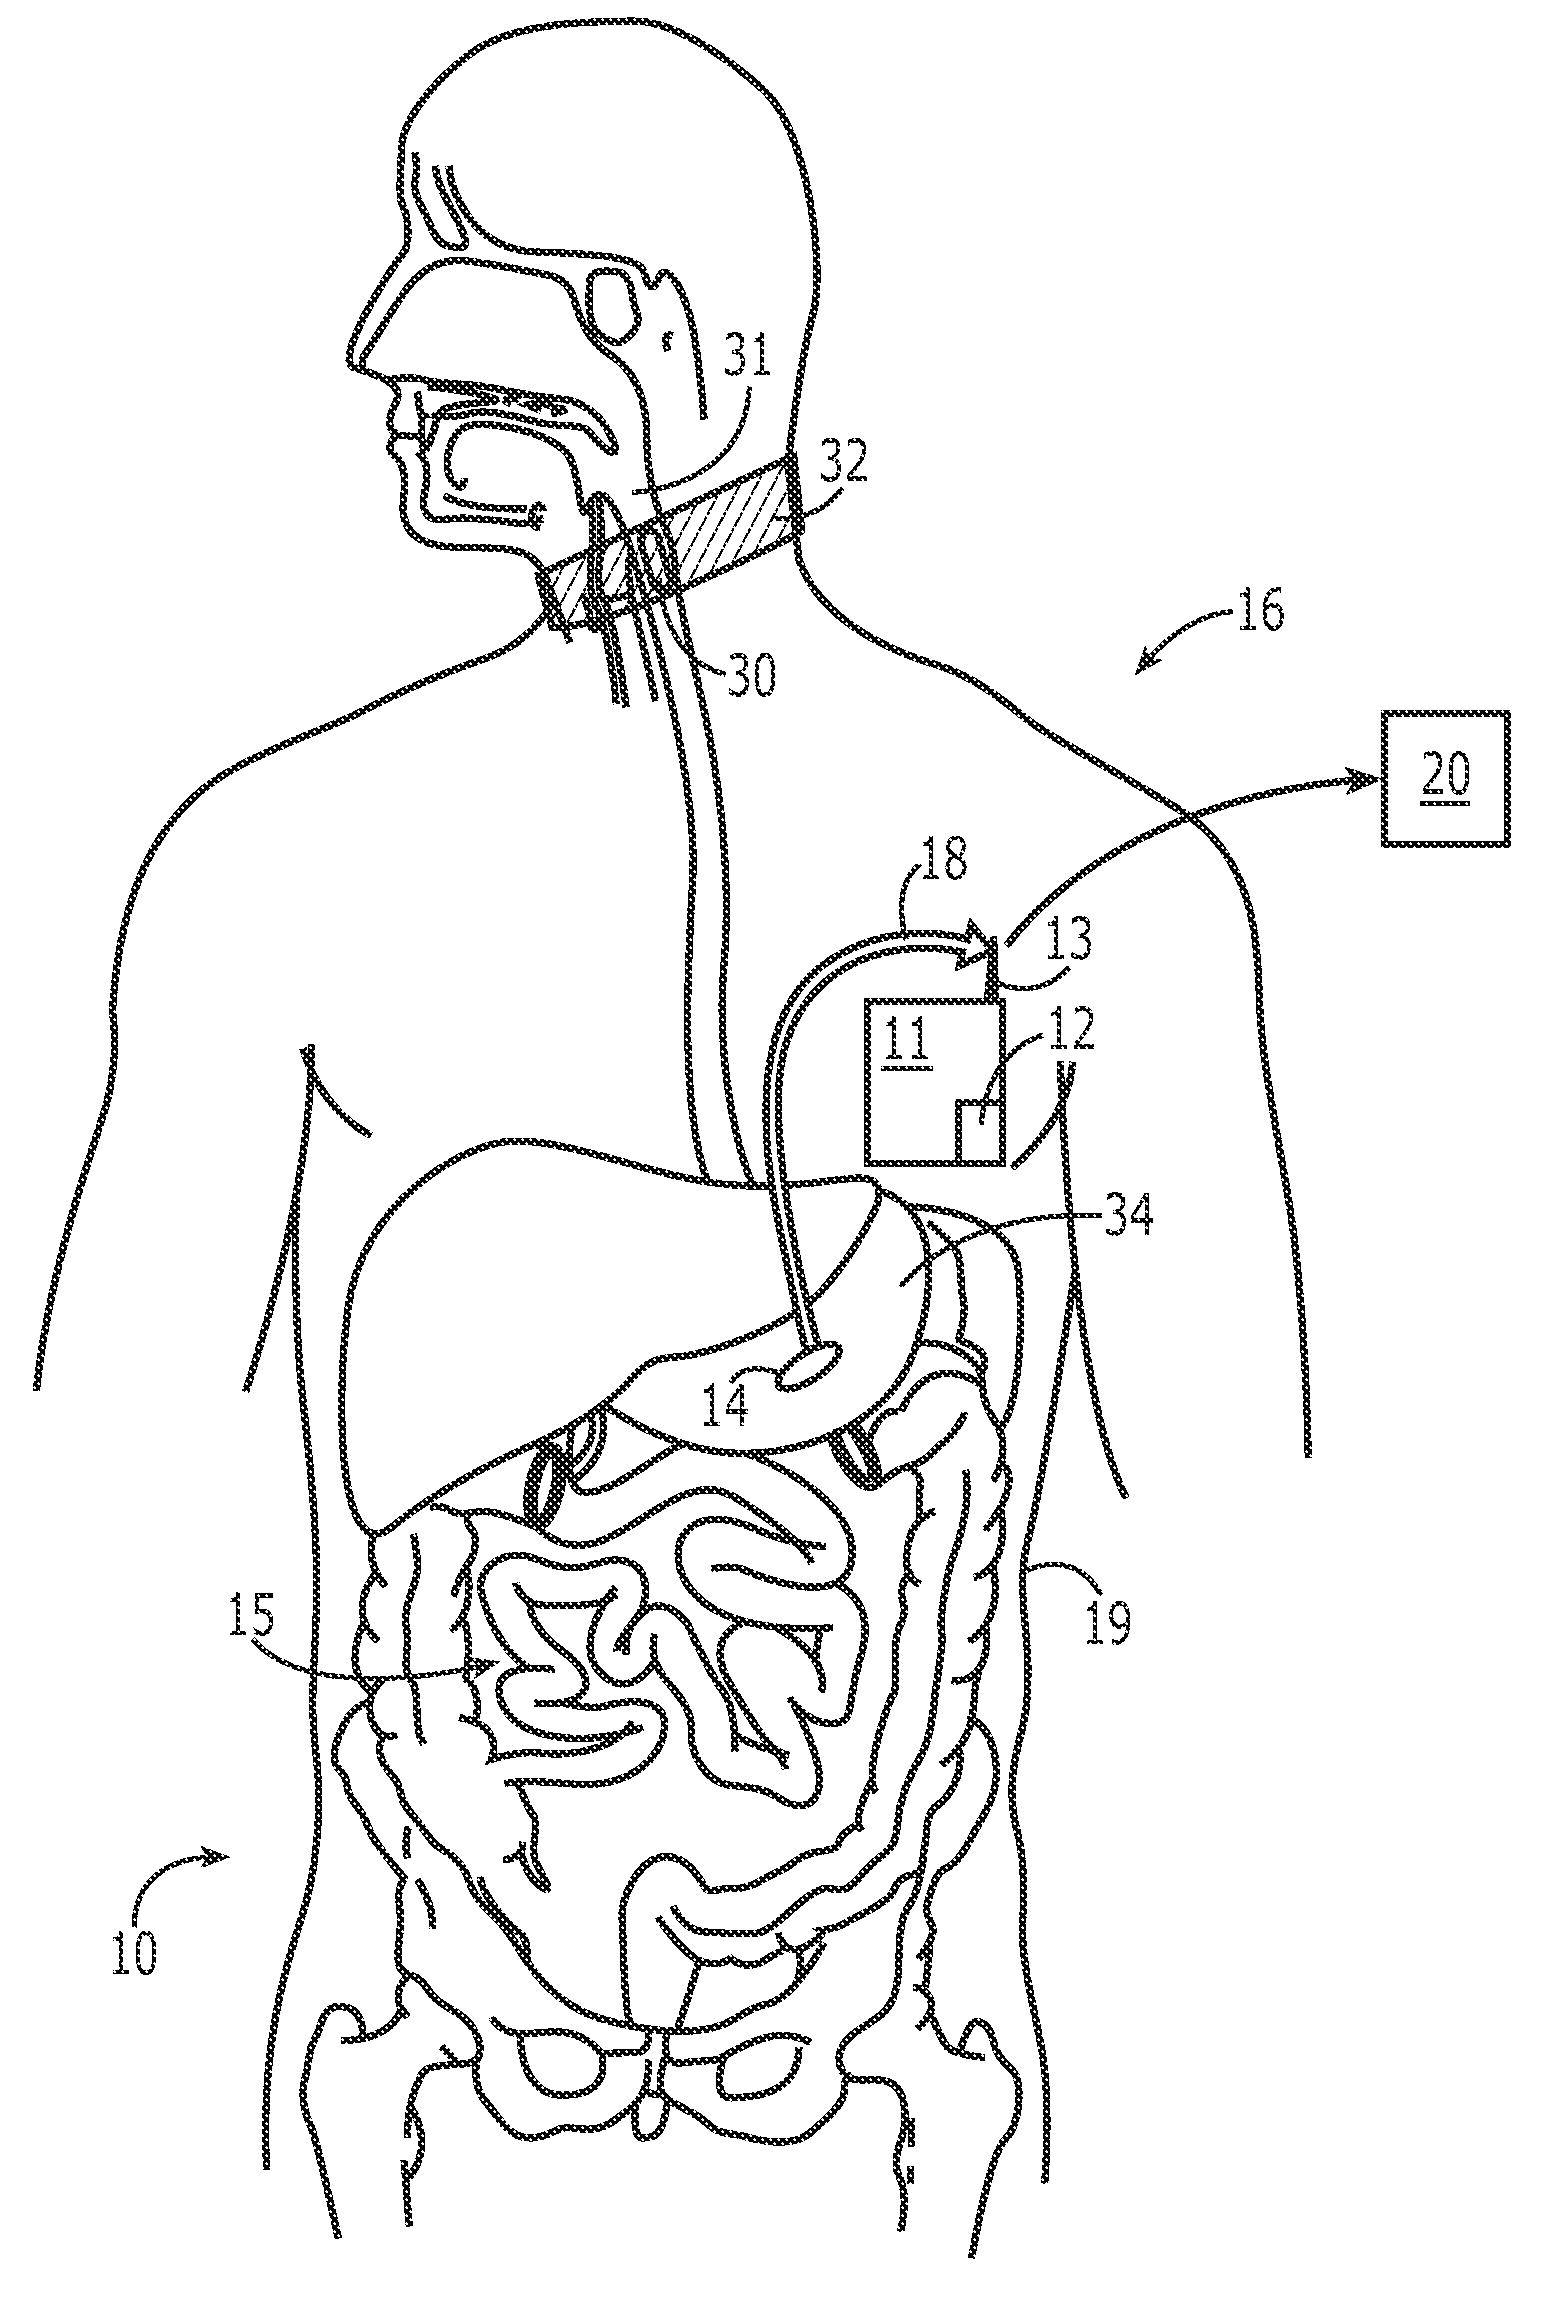 digestive system coloring sheet pin en inspirinschool system coloring digestive sheet